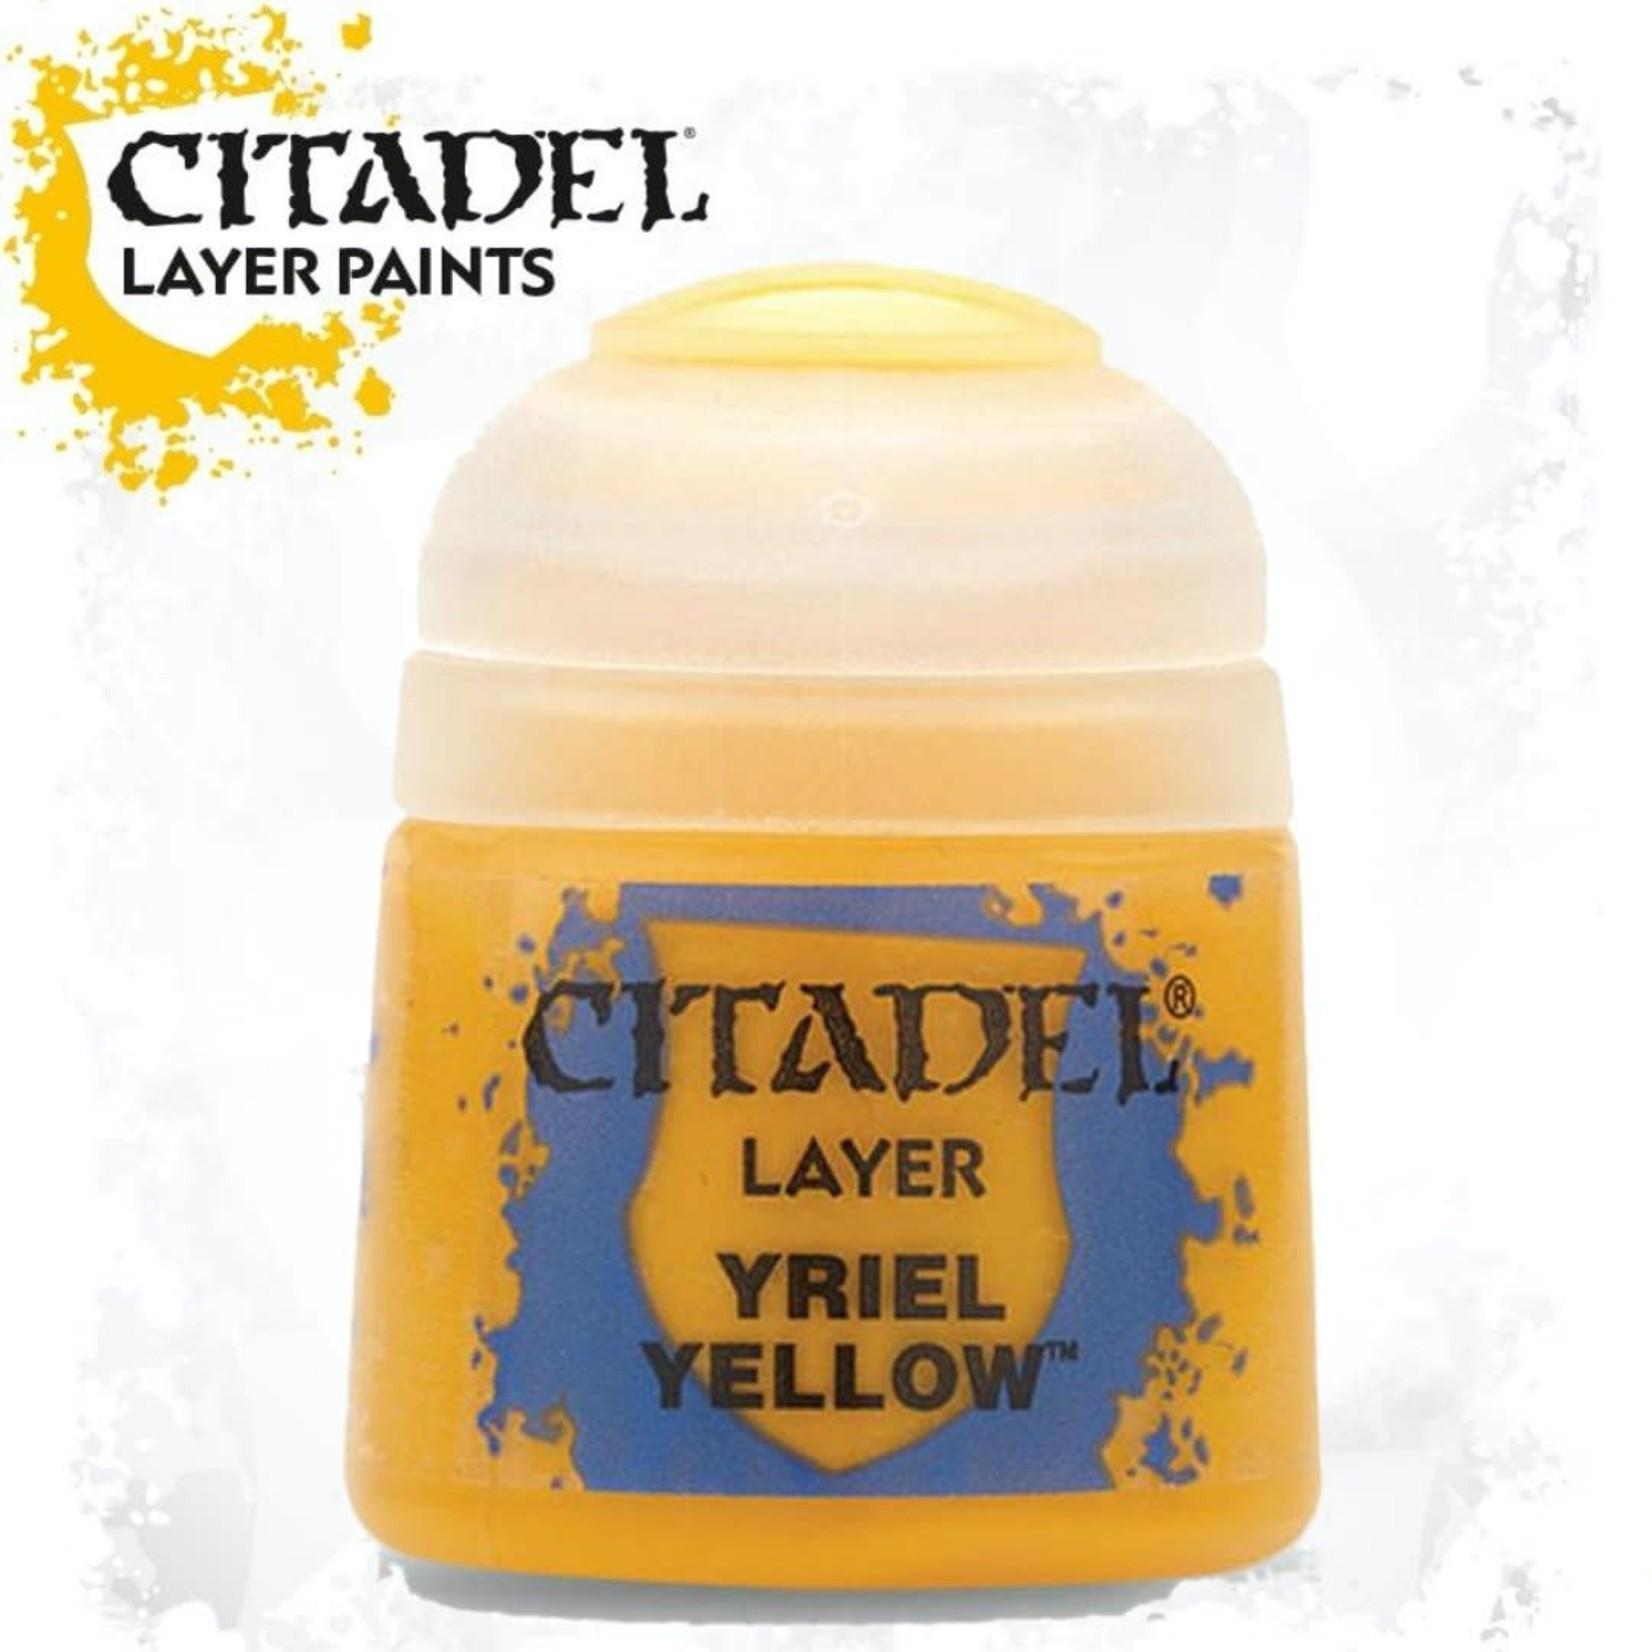 Citadel Citadel Paint - Layer: Yriel Yellow